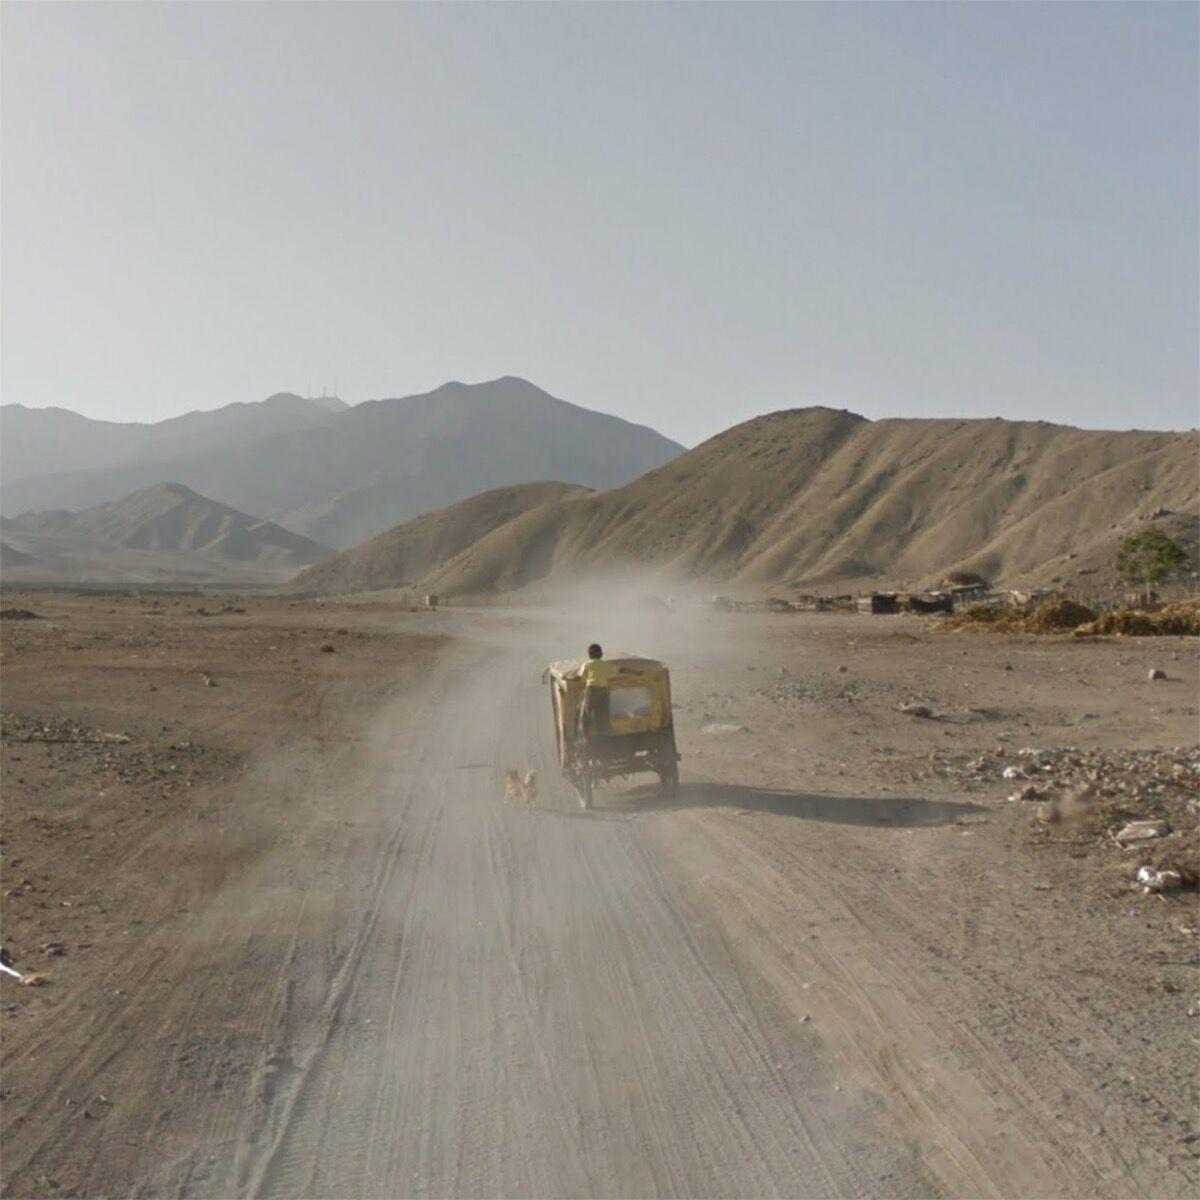 Roldan, Lima Region, Peru. Photograph by Jacqui Kenny via Google Street View.